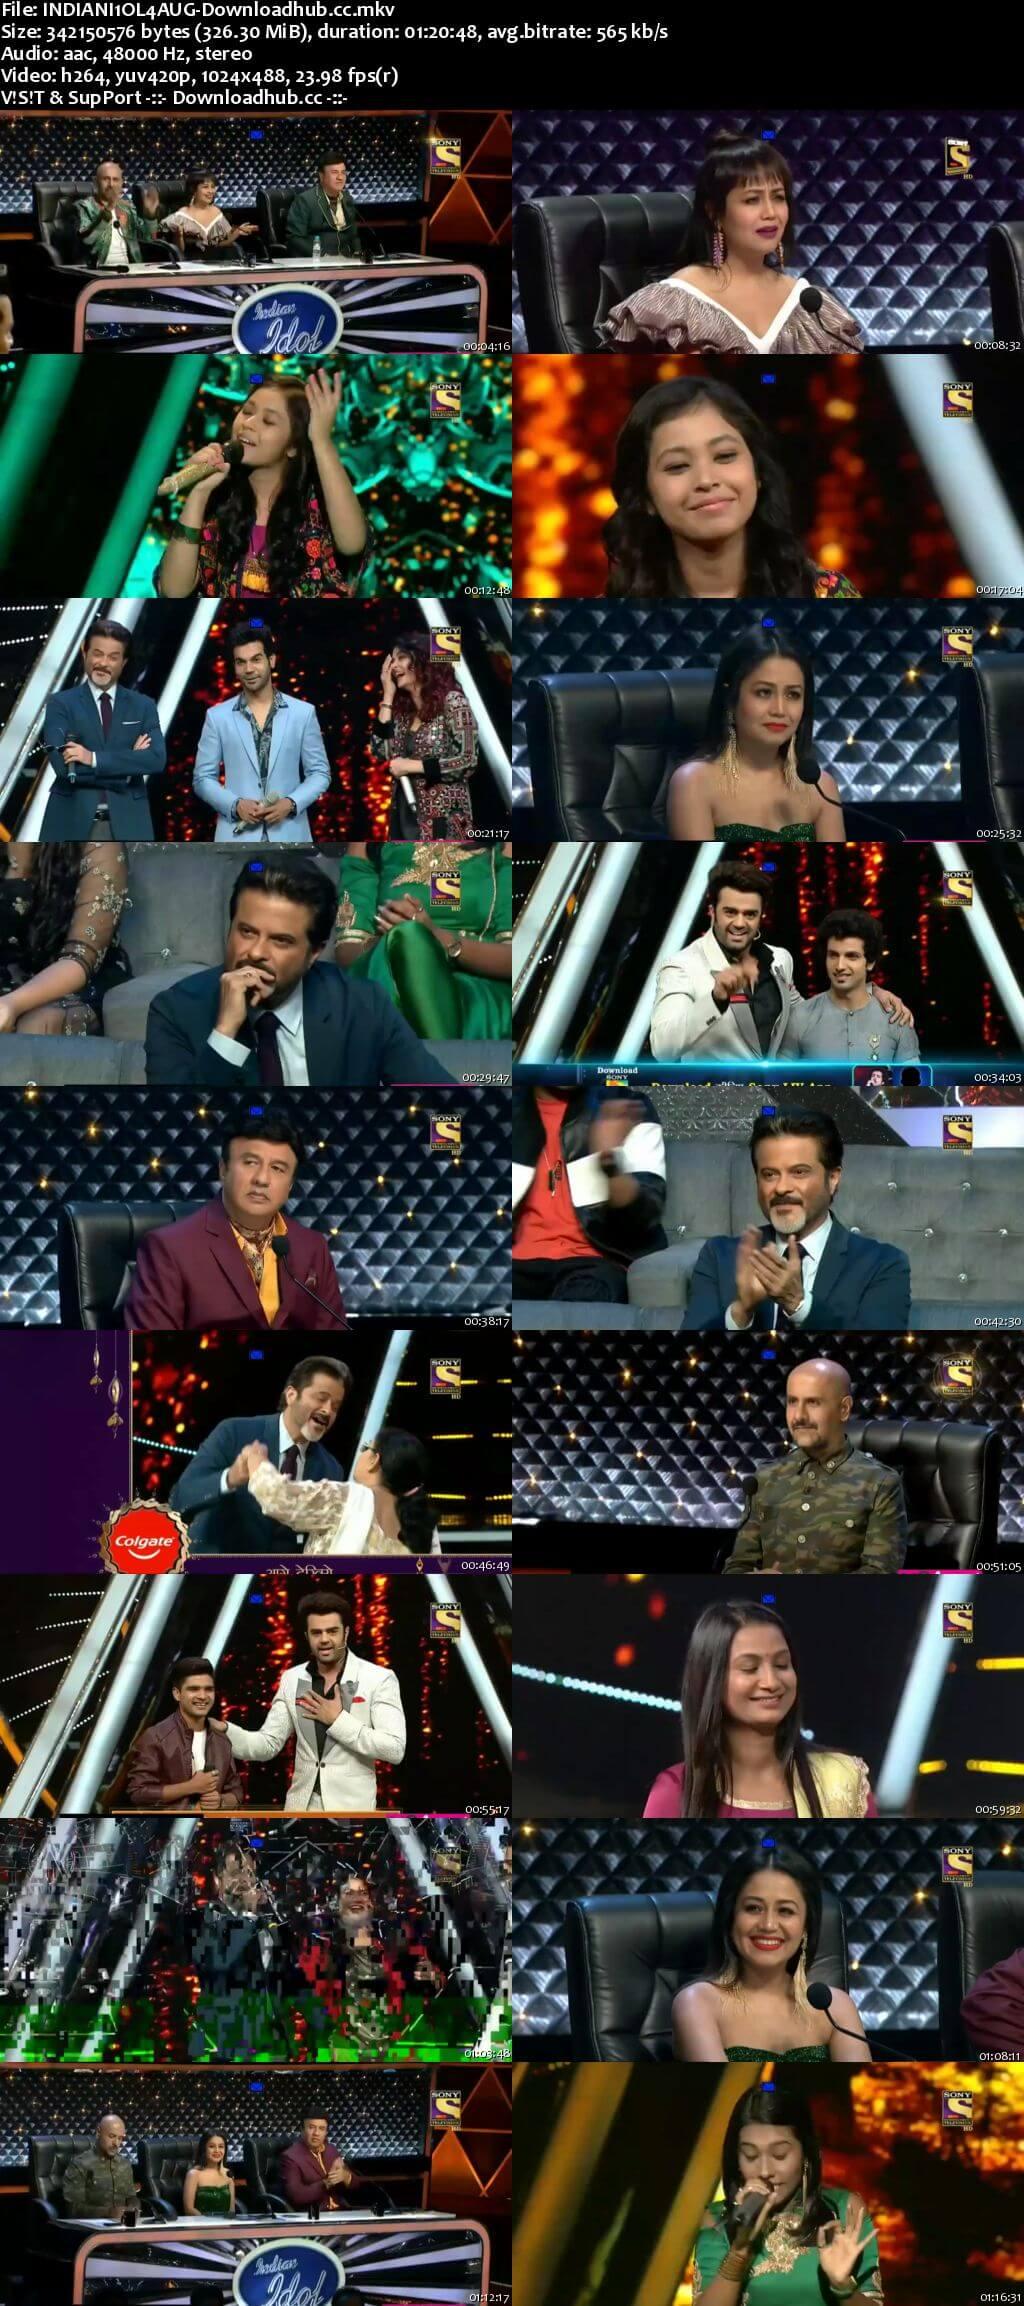 Indian Idol 04 August 2018 Episode 09 HDTV 480p